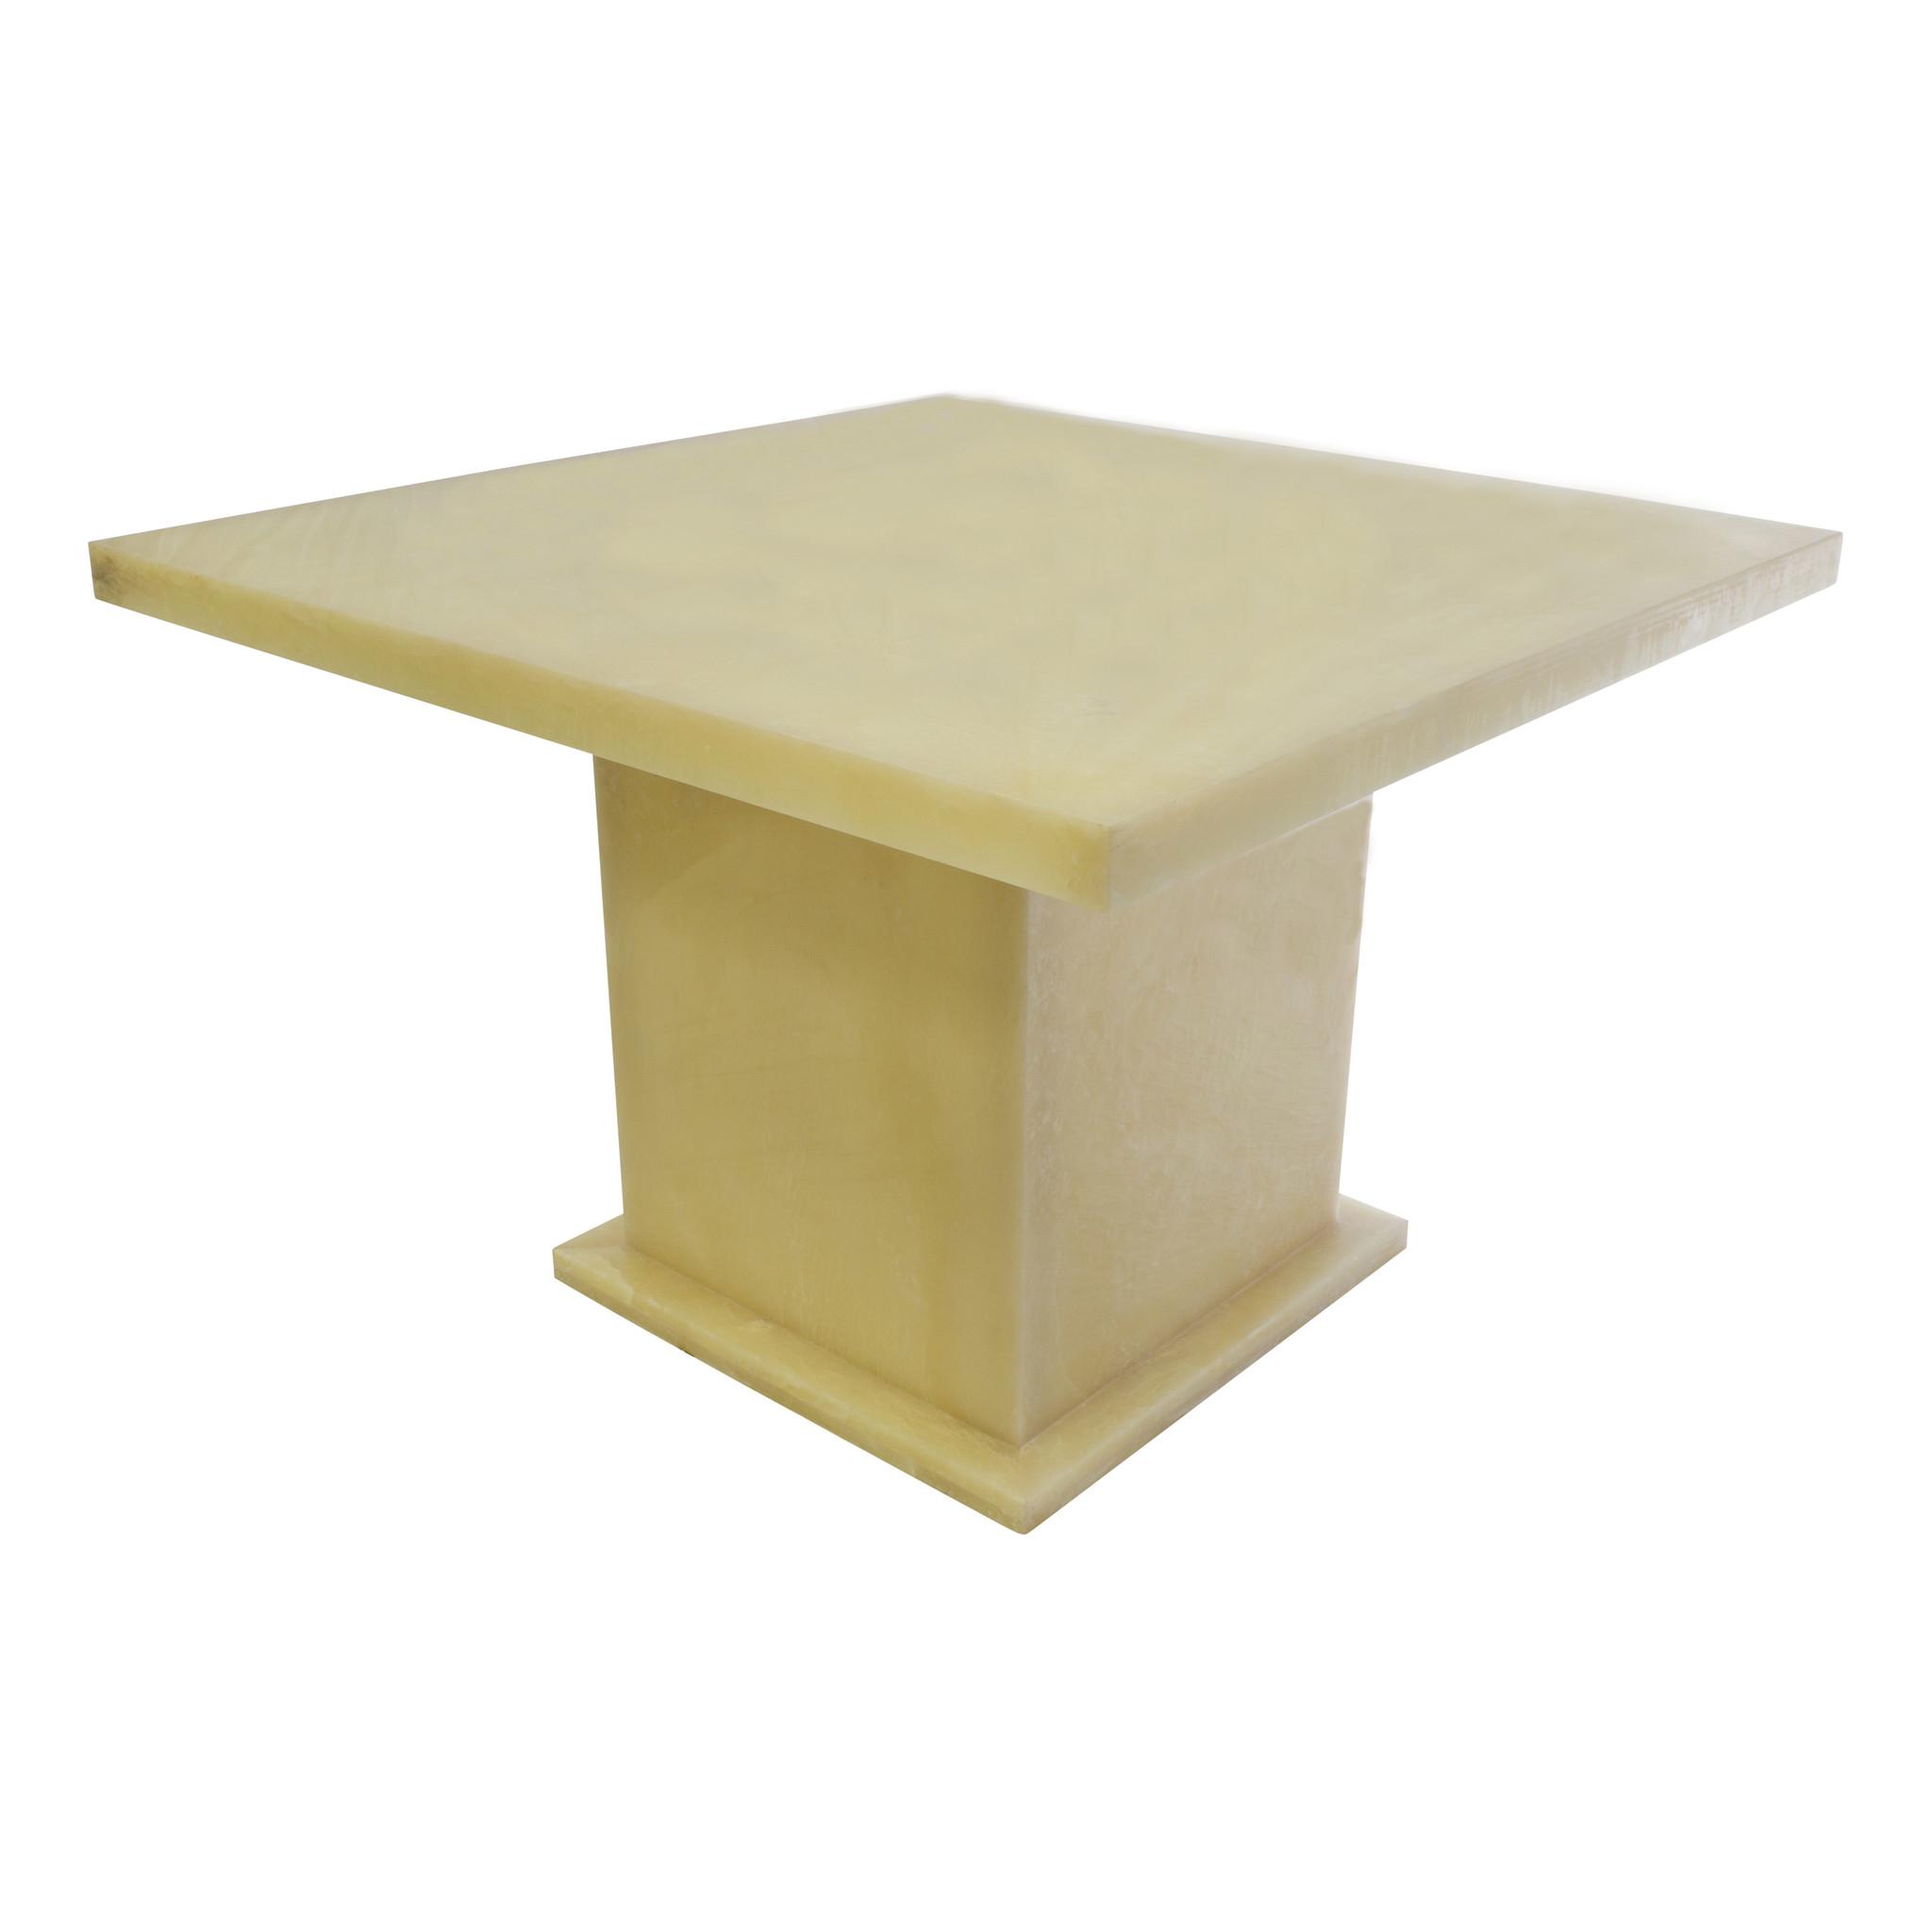 Indomarmer Onyx Eettafel Vierkant 120x120x79 cm